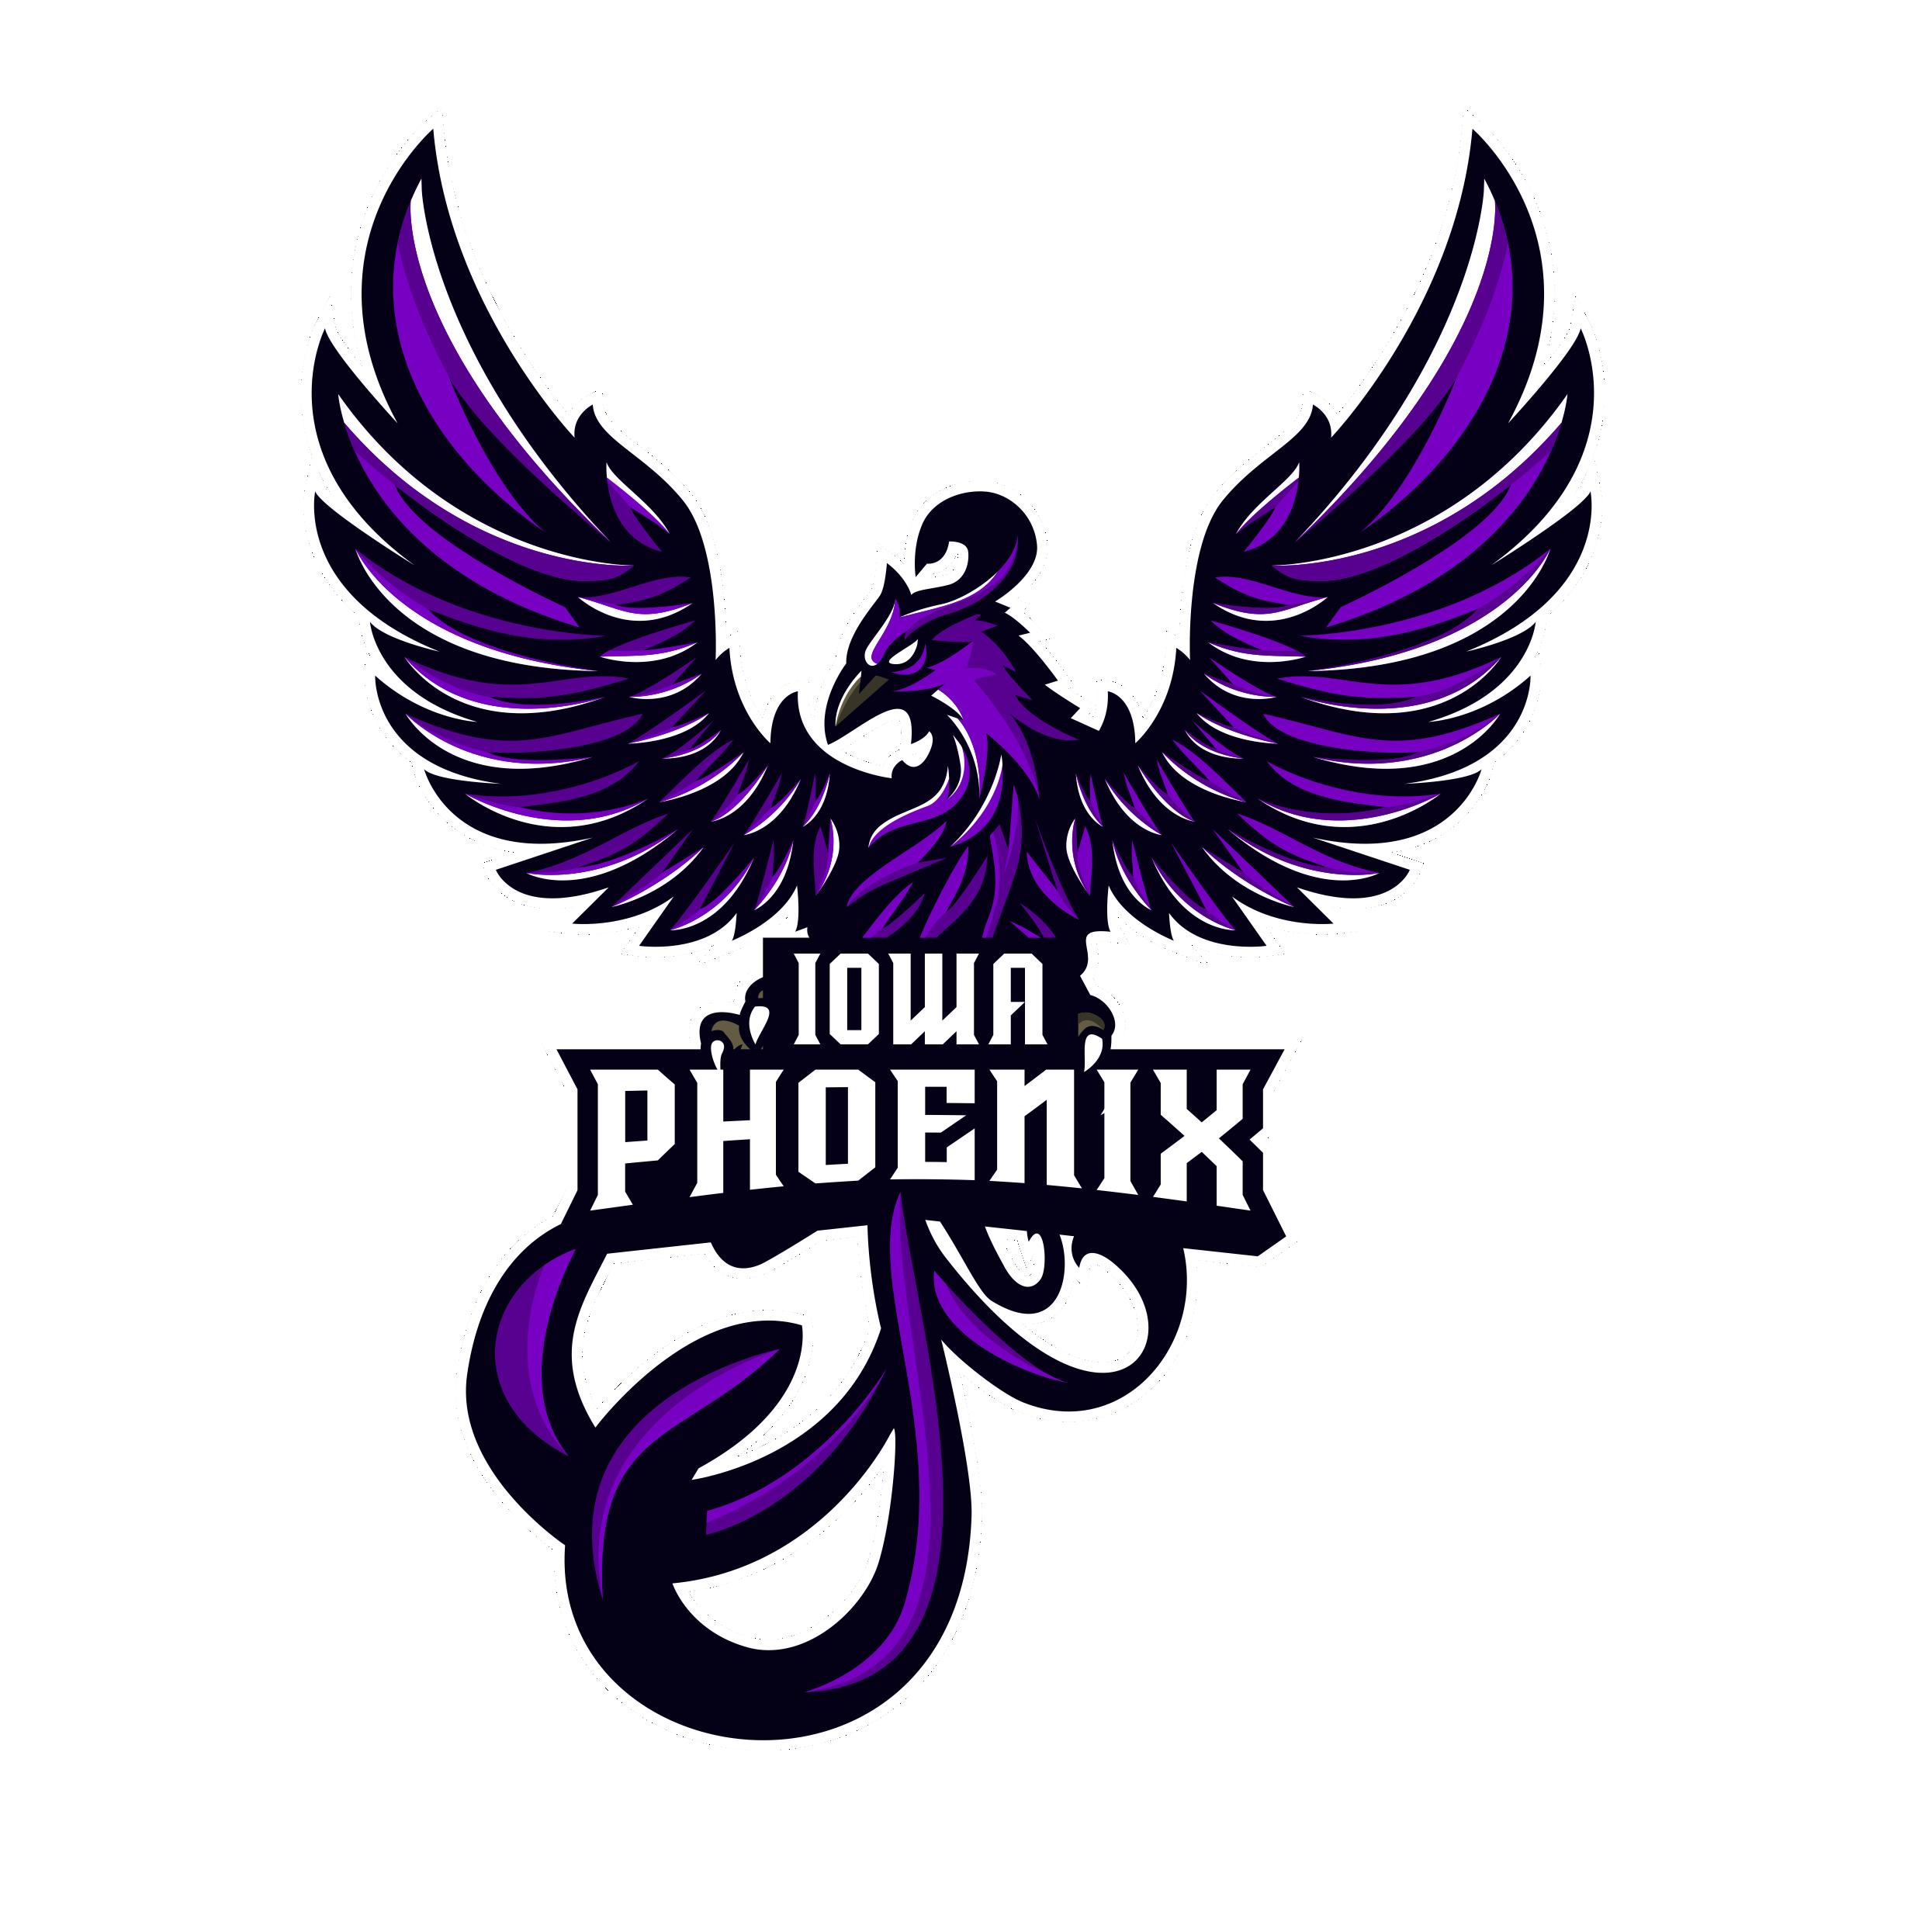 Iowa Phoenix